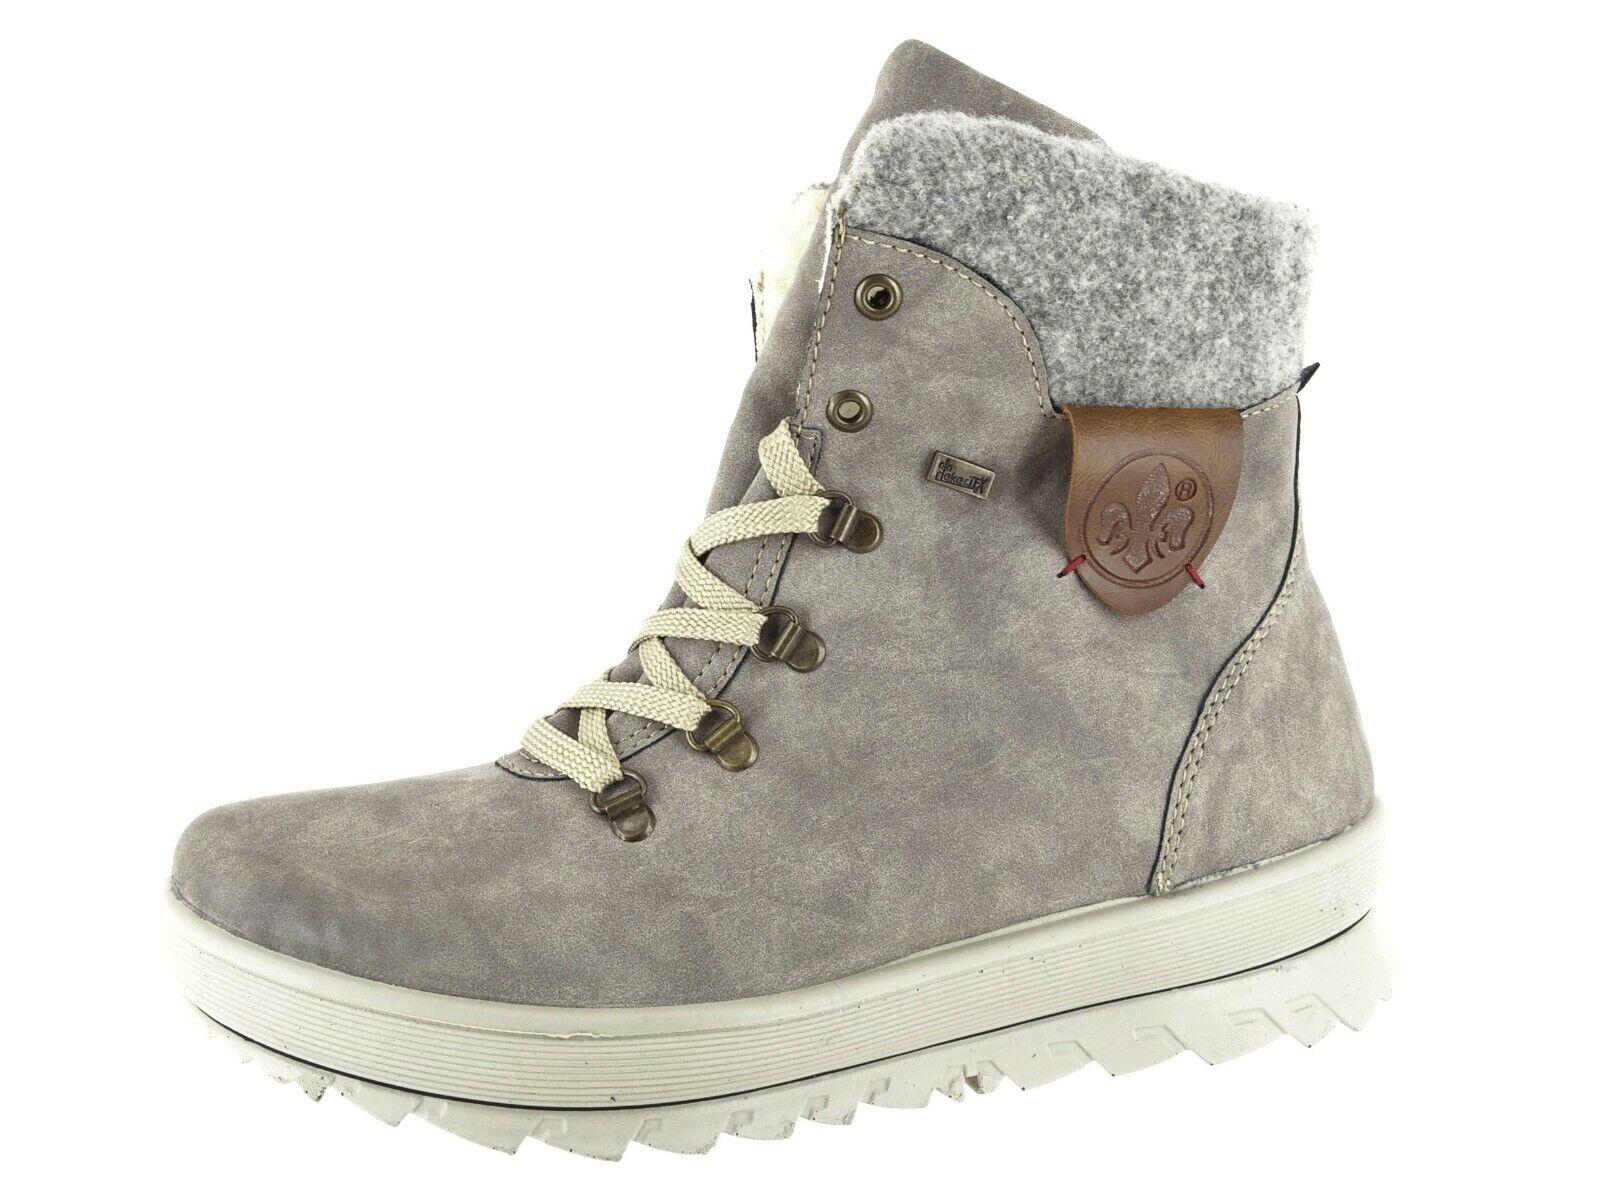 Rieker Damen Boots Stiefeletten Schuhe Kunstleder Profilsohle warm gefüttert